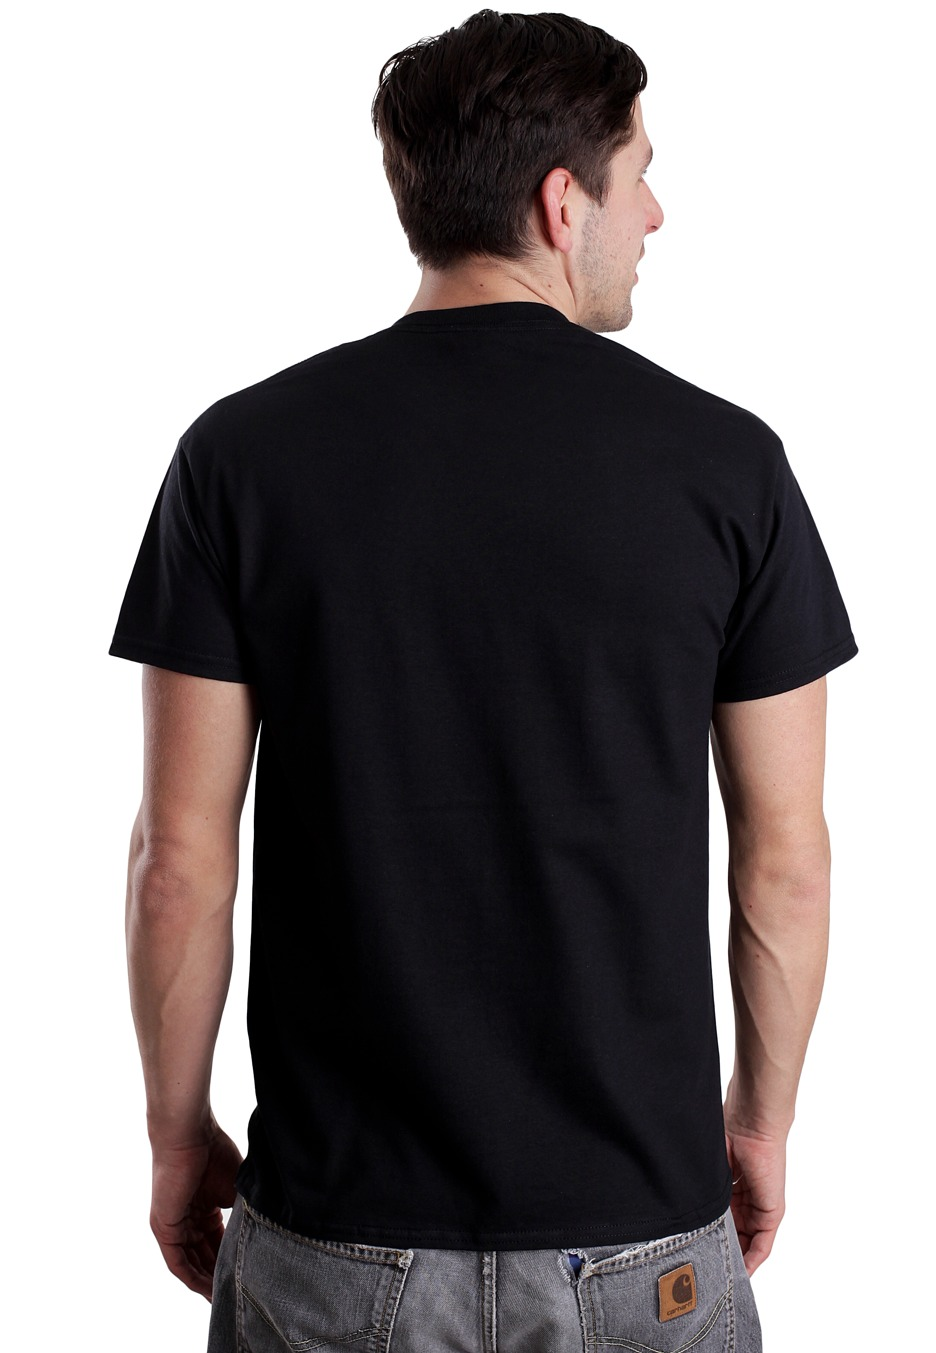 chelsea grin my damnation t shirt official deathcore merchandise shop. Black Bedroom Furniture Sets. Home Design Ideas